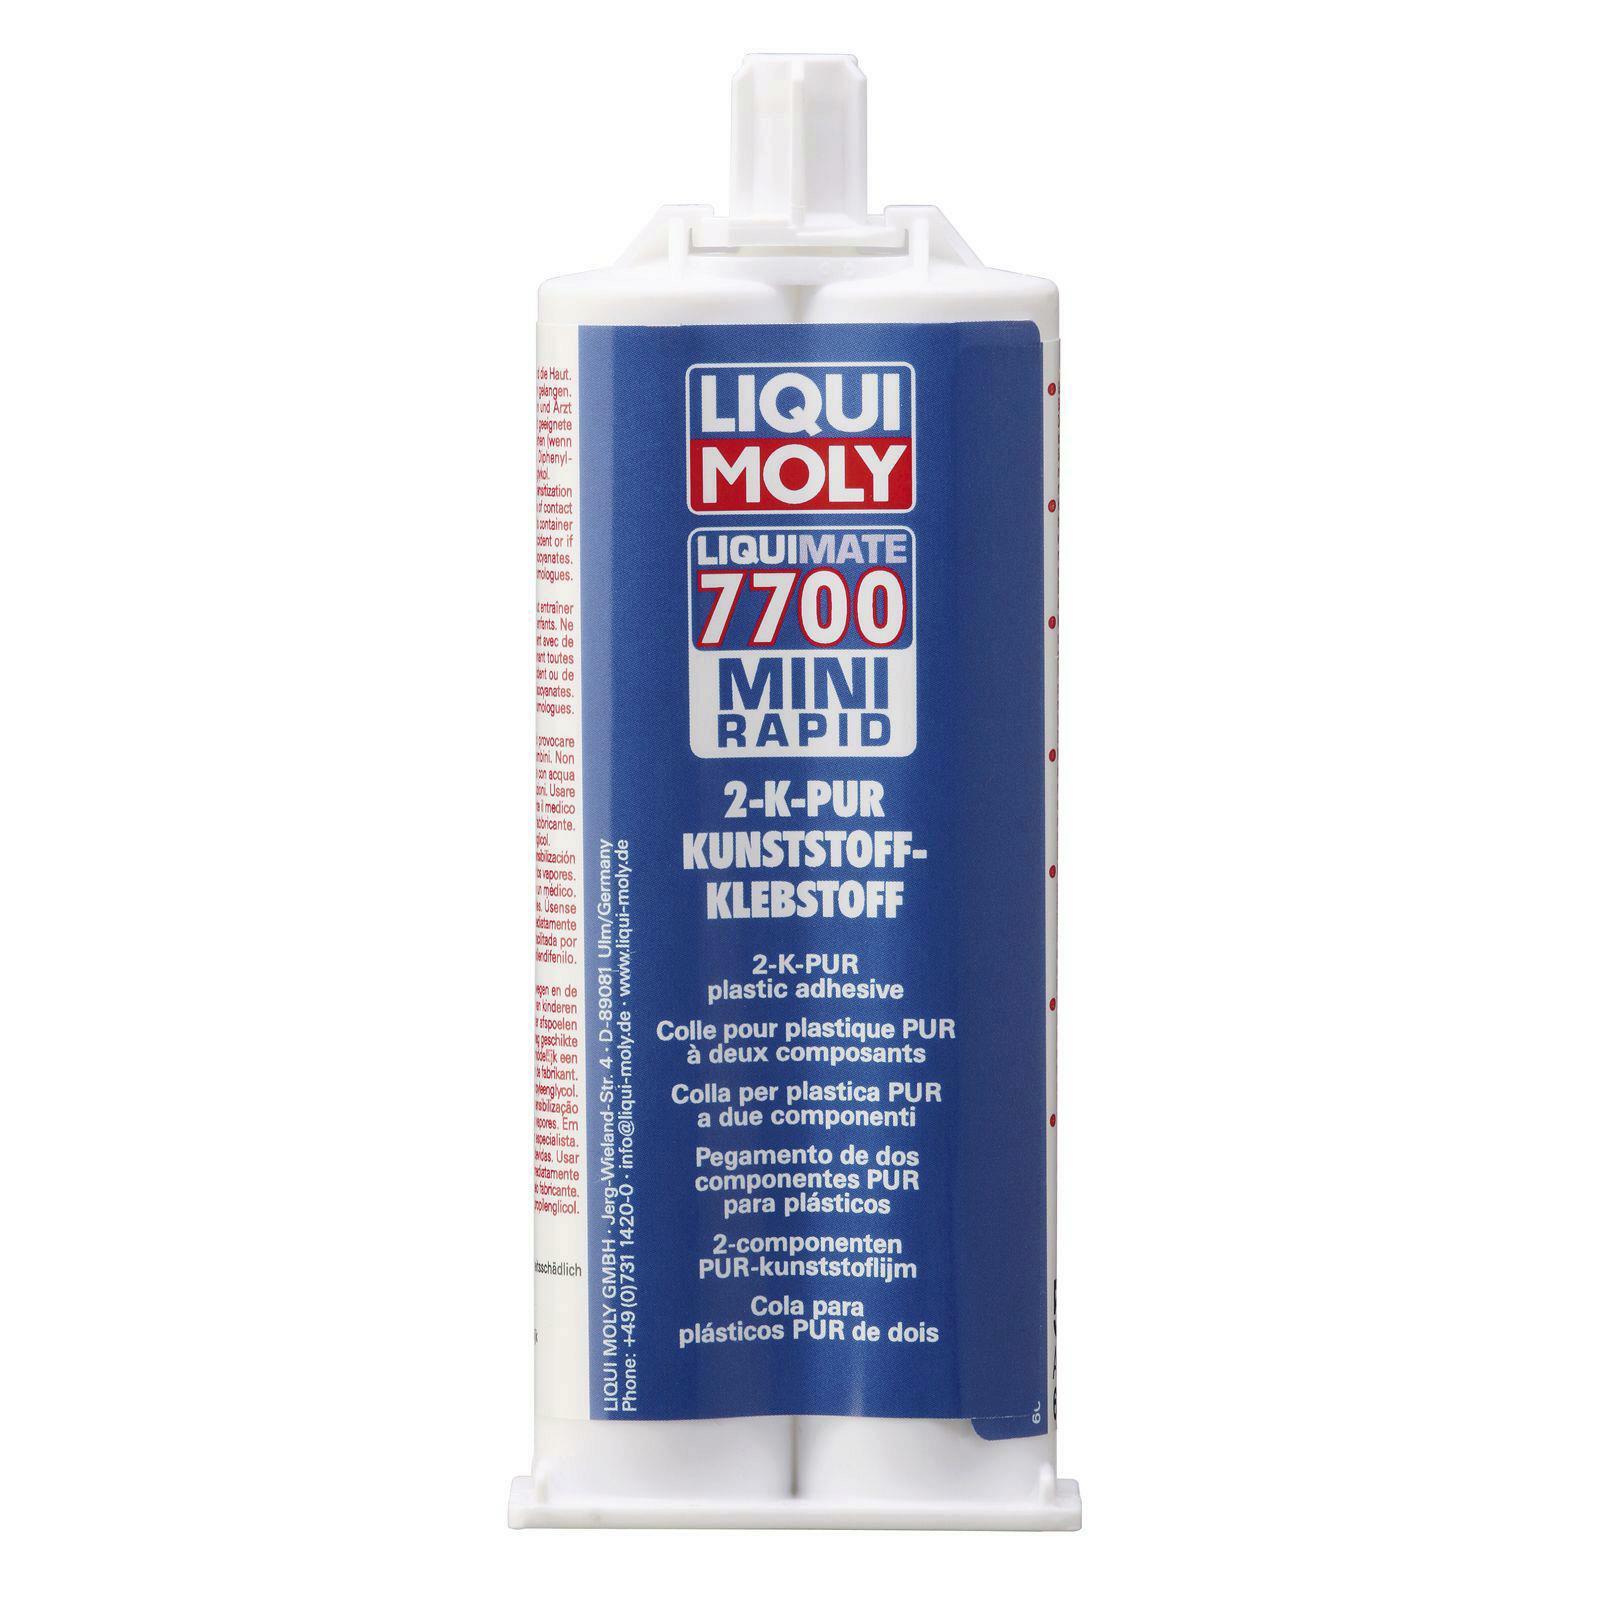 Liqui Moly Liquimate 7700 Mini Rapid Kartusche 50ml